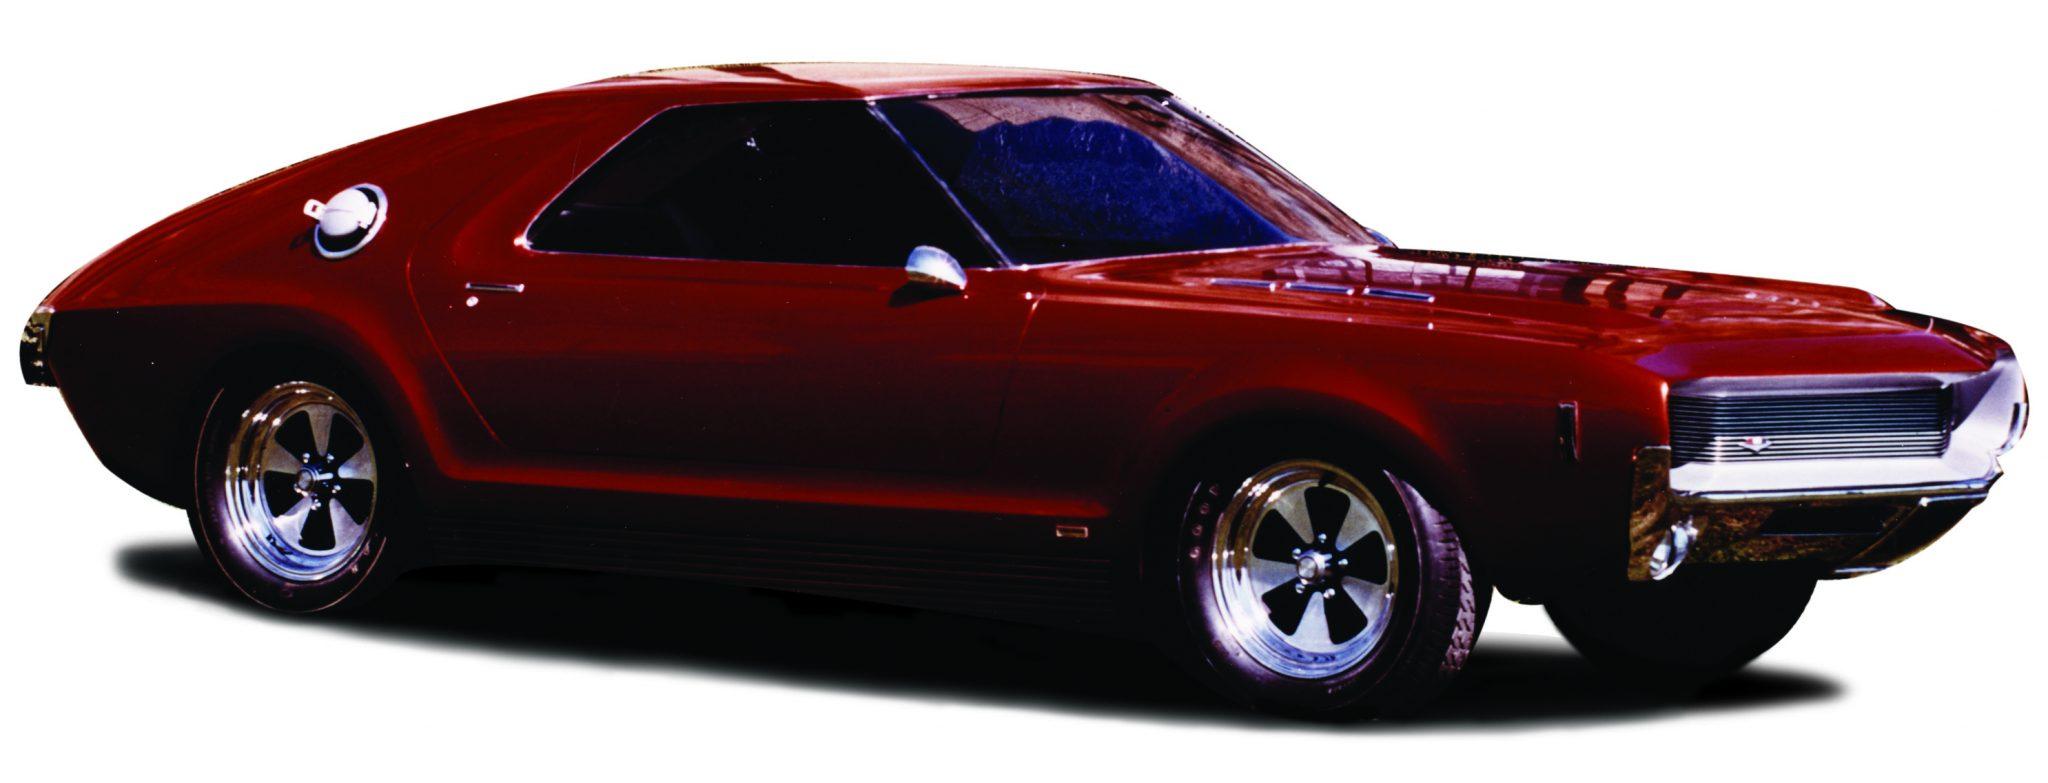 AMX fiberglass concept car